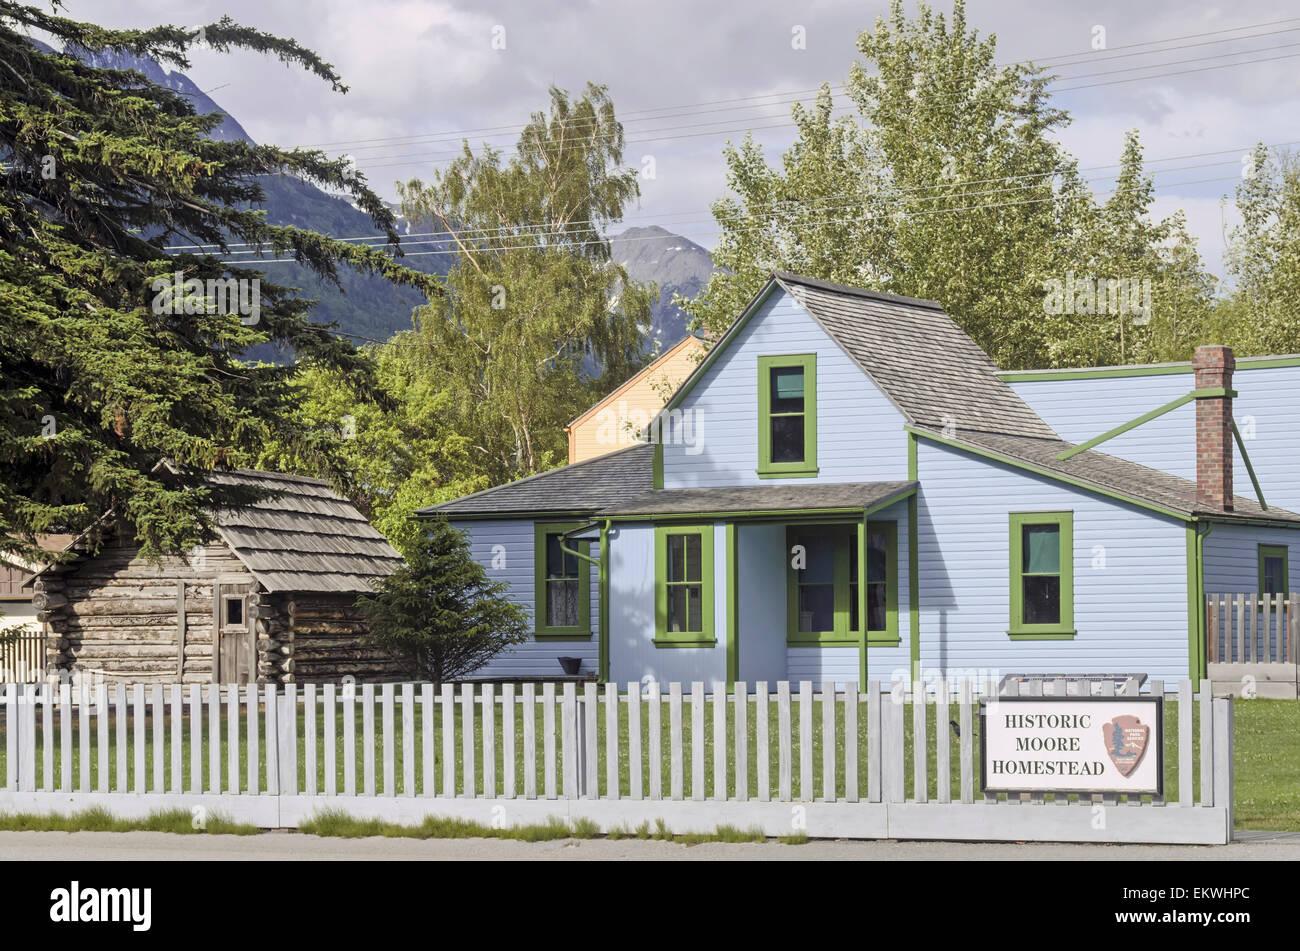 Historischen Moore Homestead in Skagway, Alaska Stockbild